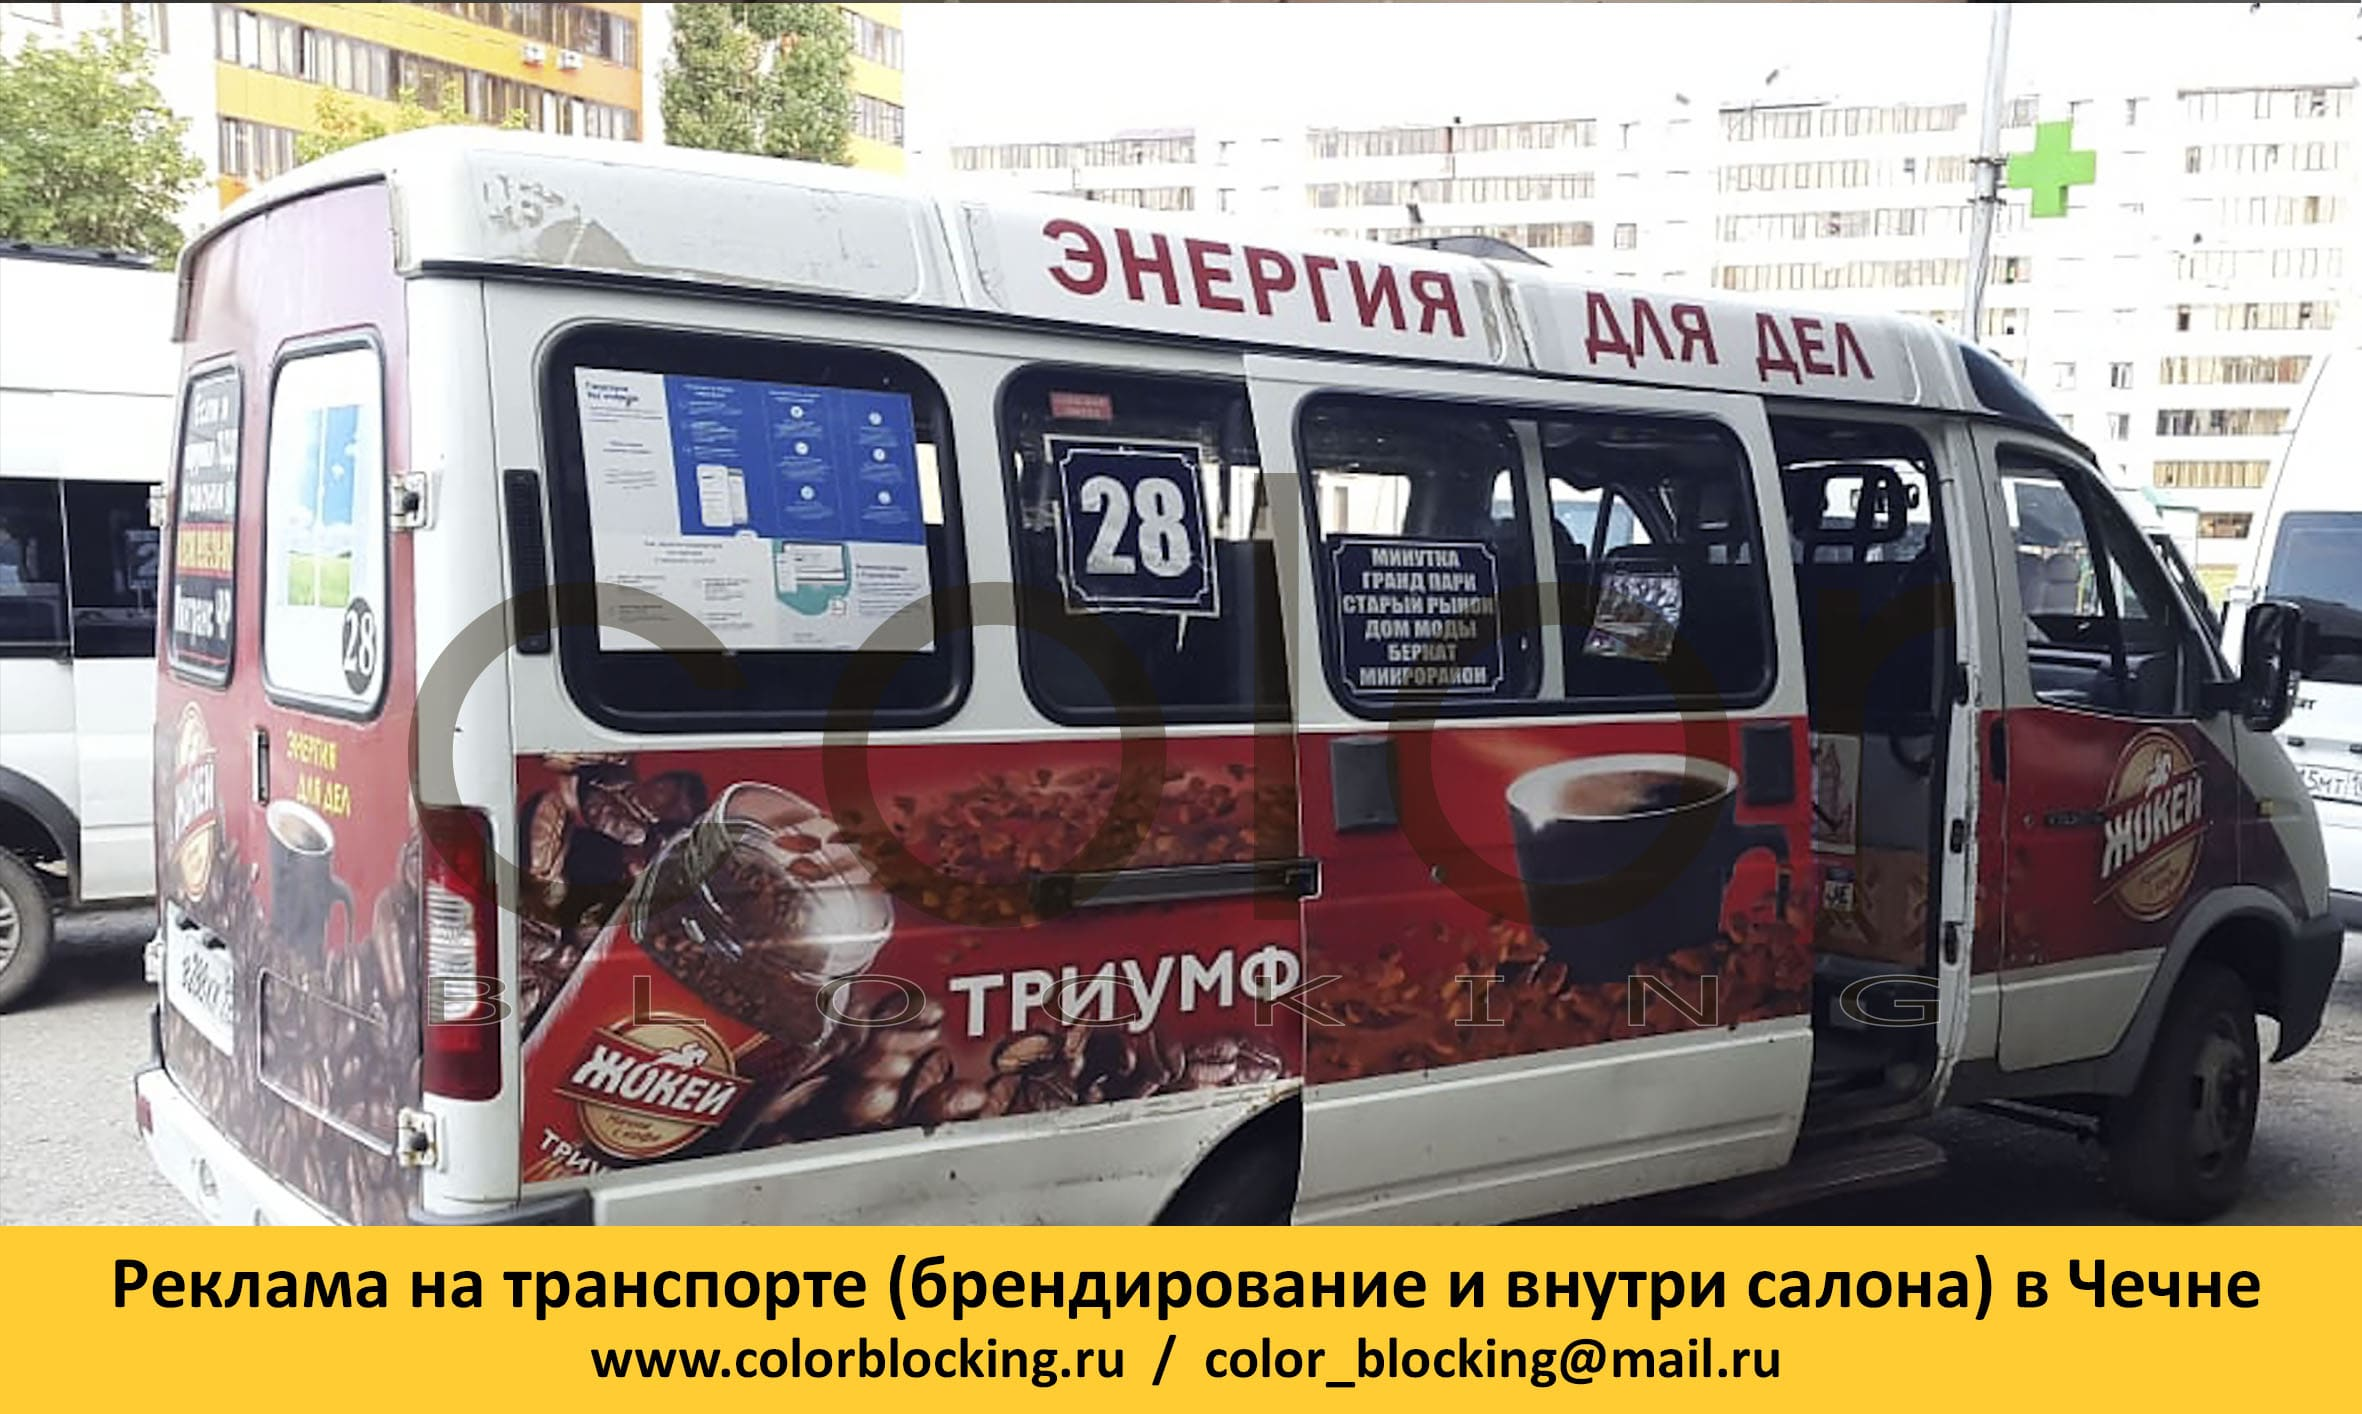 Реклама на транспорте в Аргуне брендирование